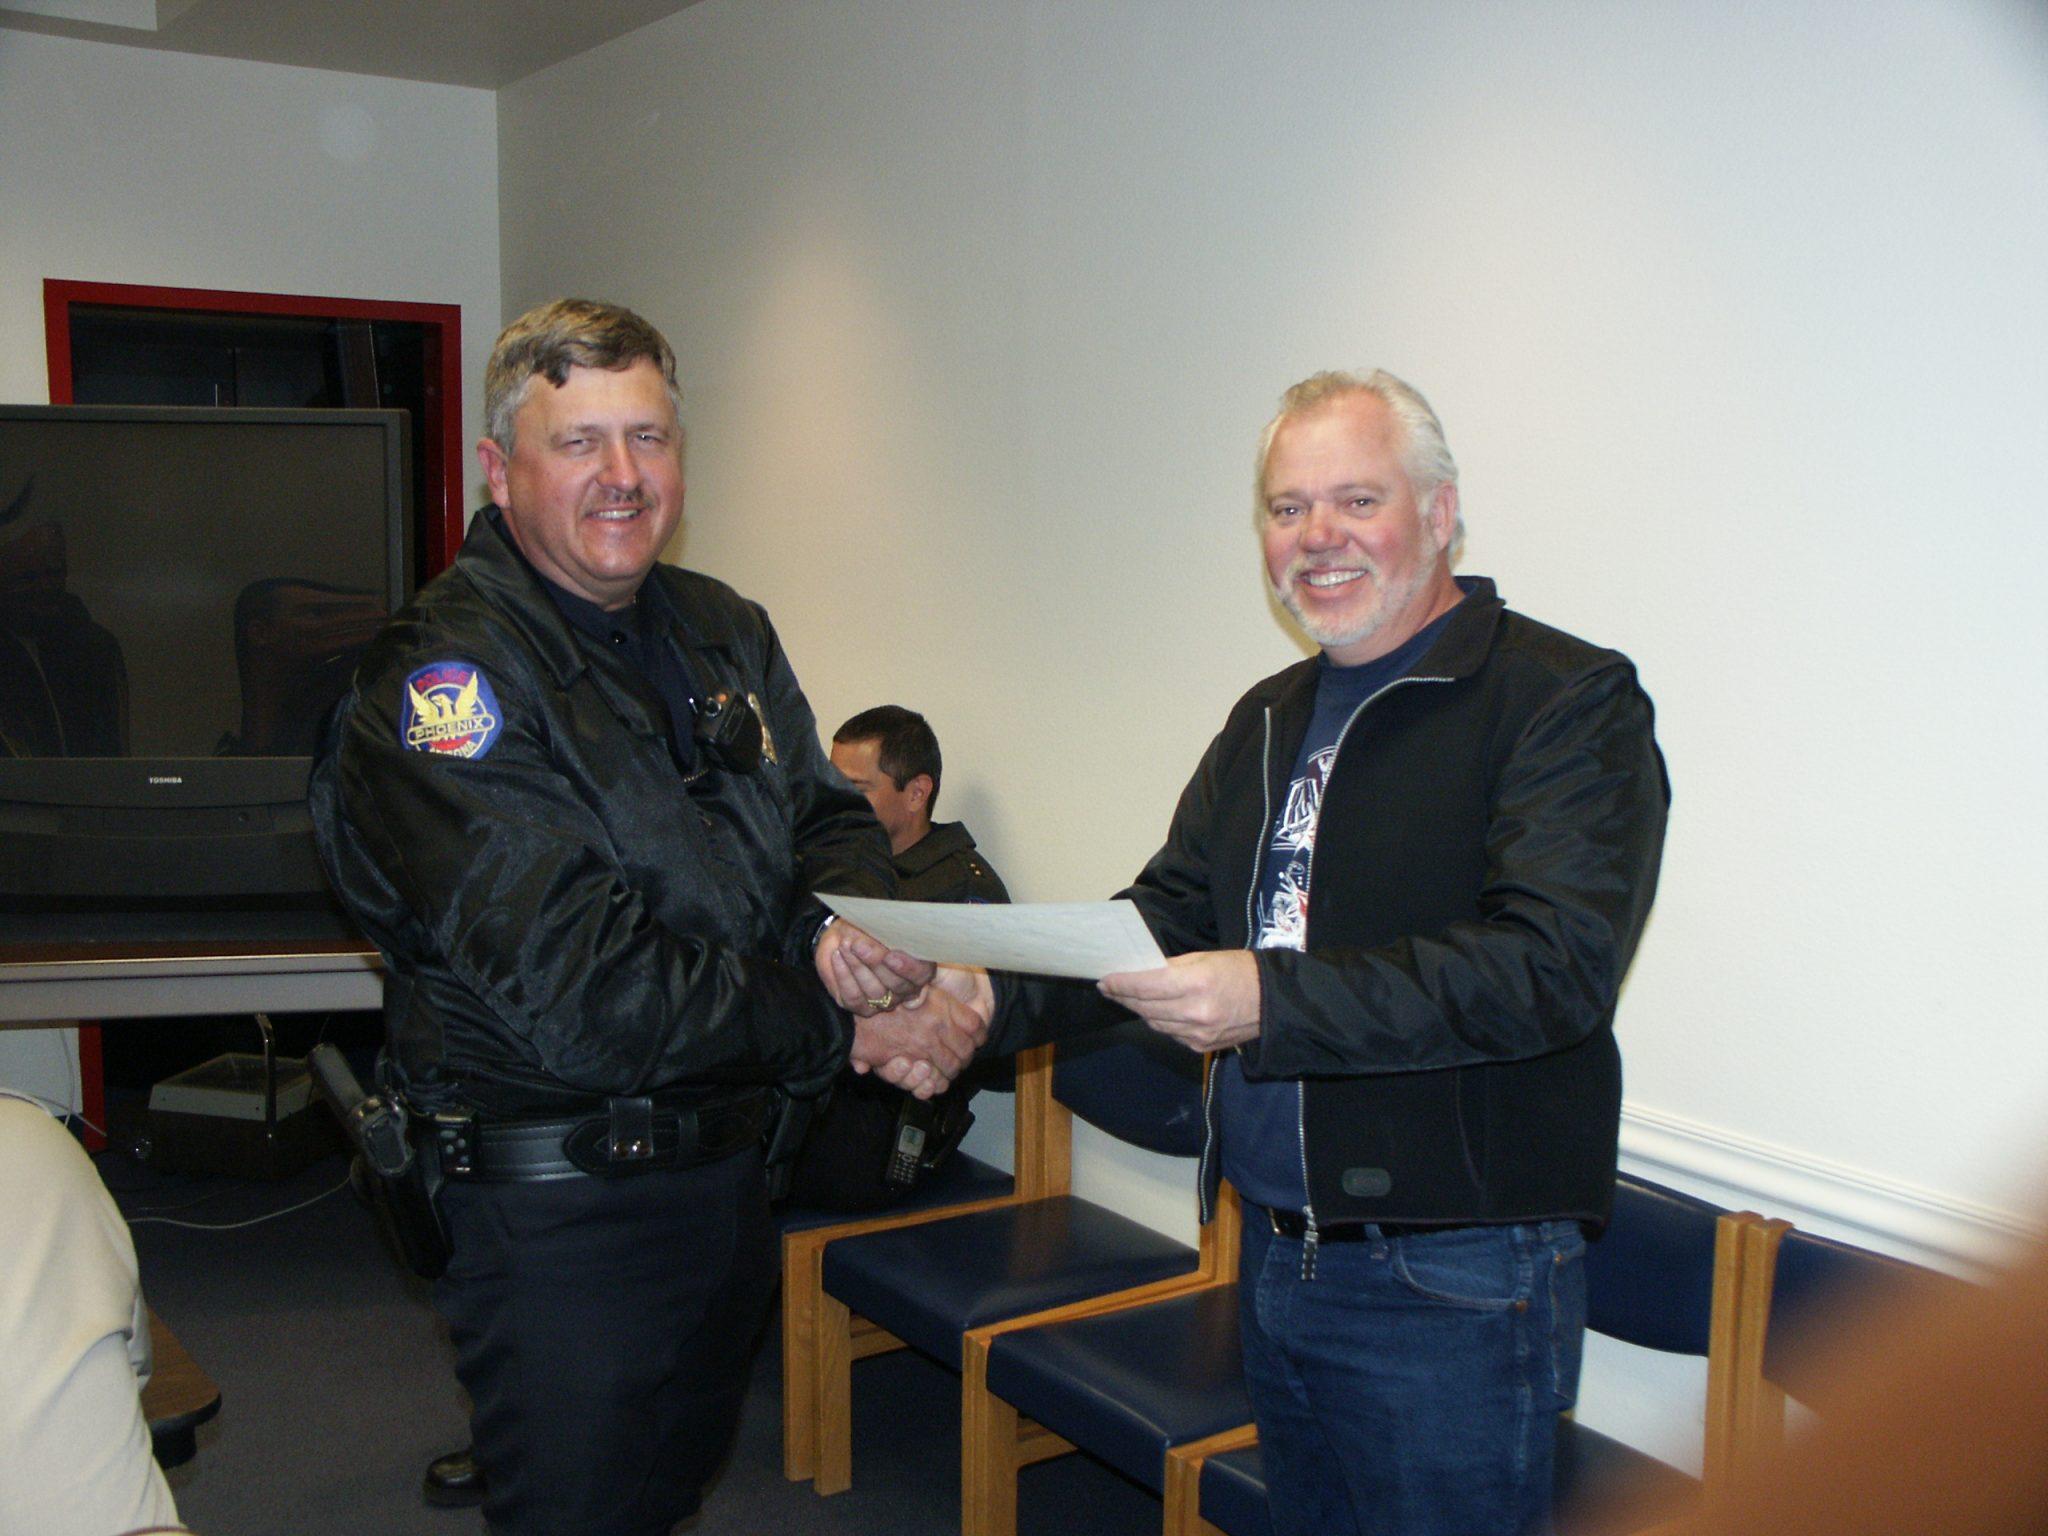 Men shaking hands, one is a cop